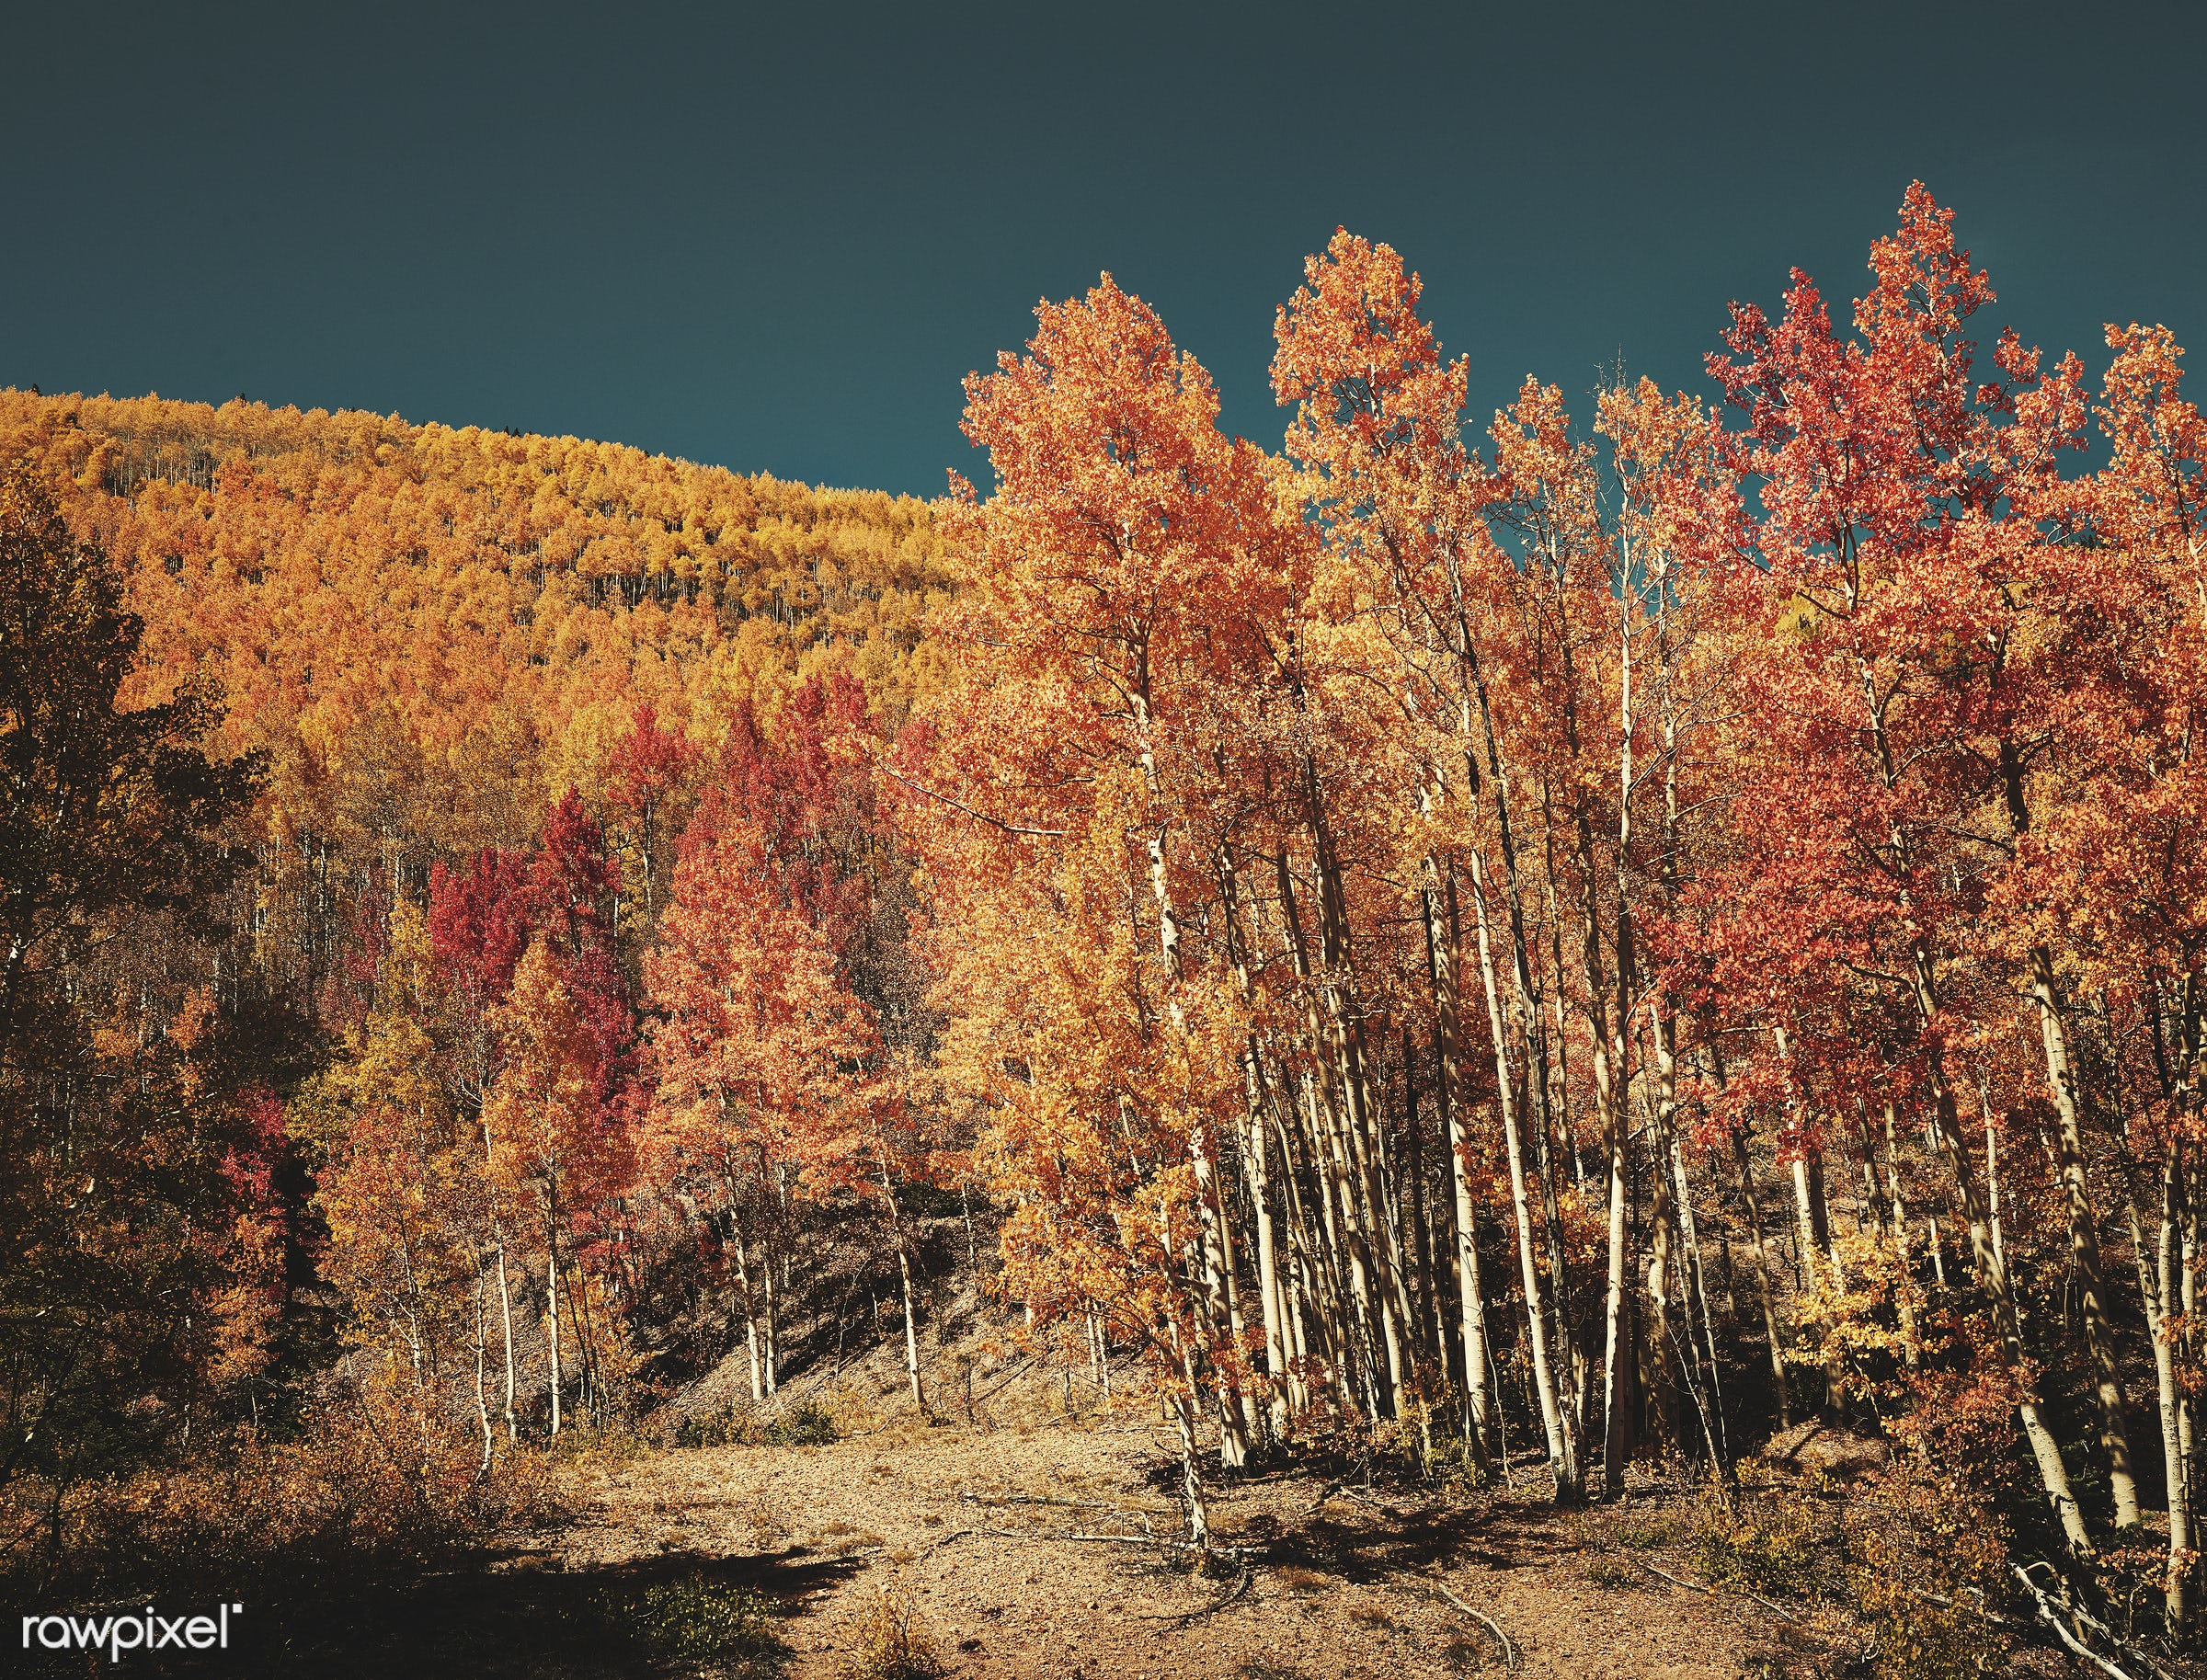 Fall aspens in San Juan County, Colorado USA - Original image from Carol M. Highsmith's America, Library of Congress...